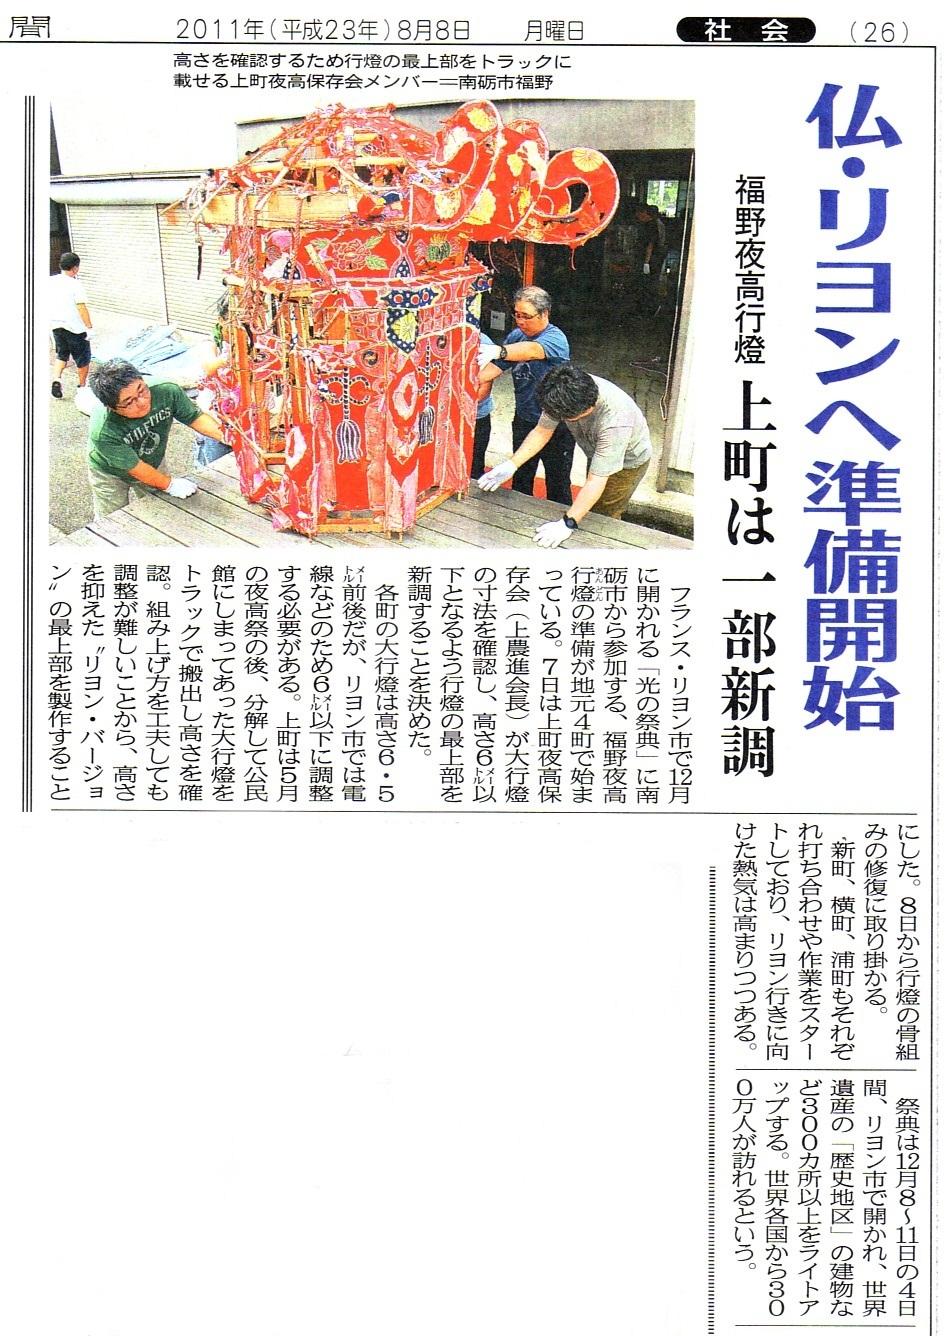 2011_8_8_kitanihon.jpg